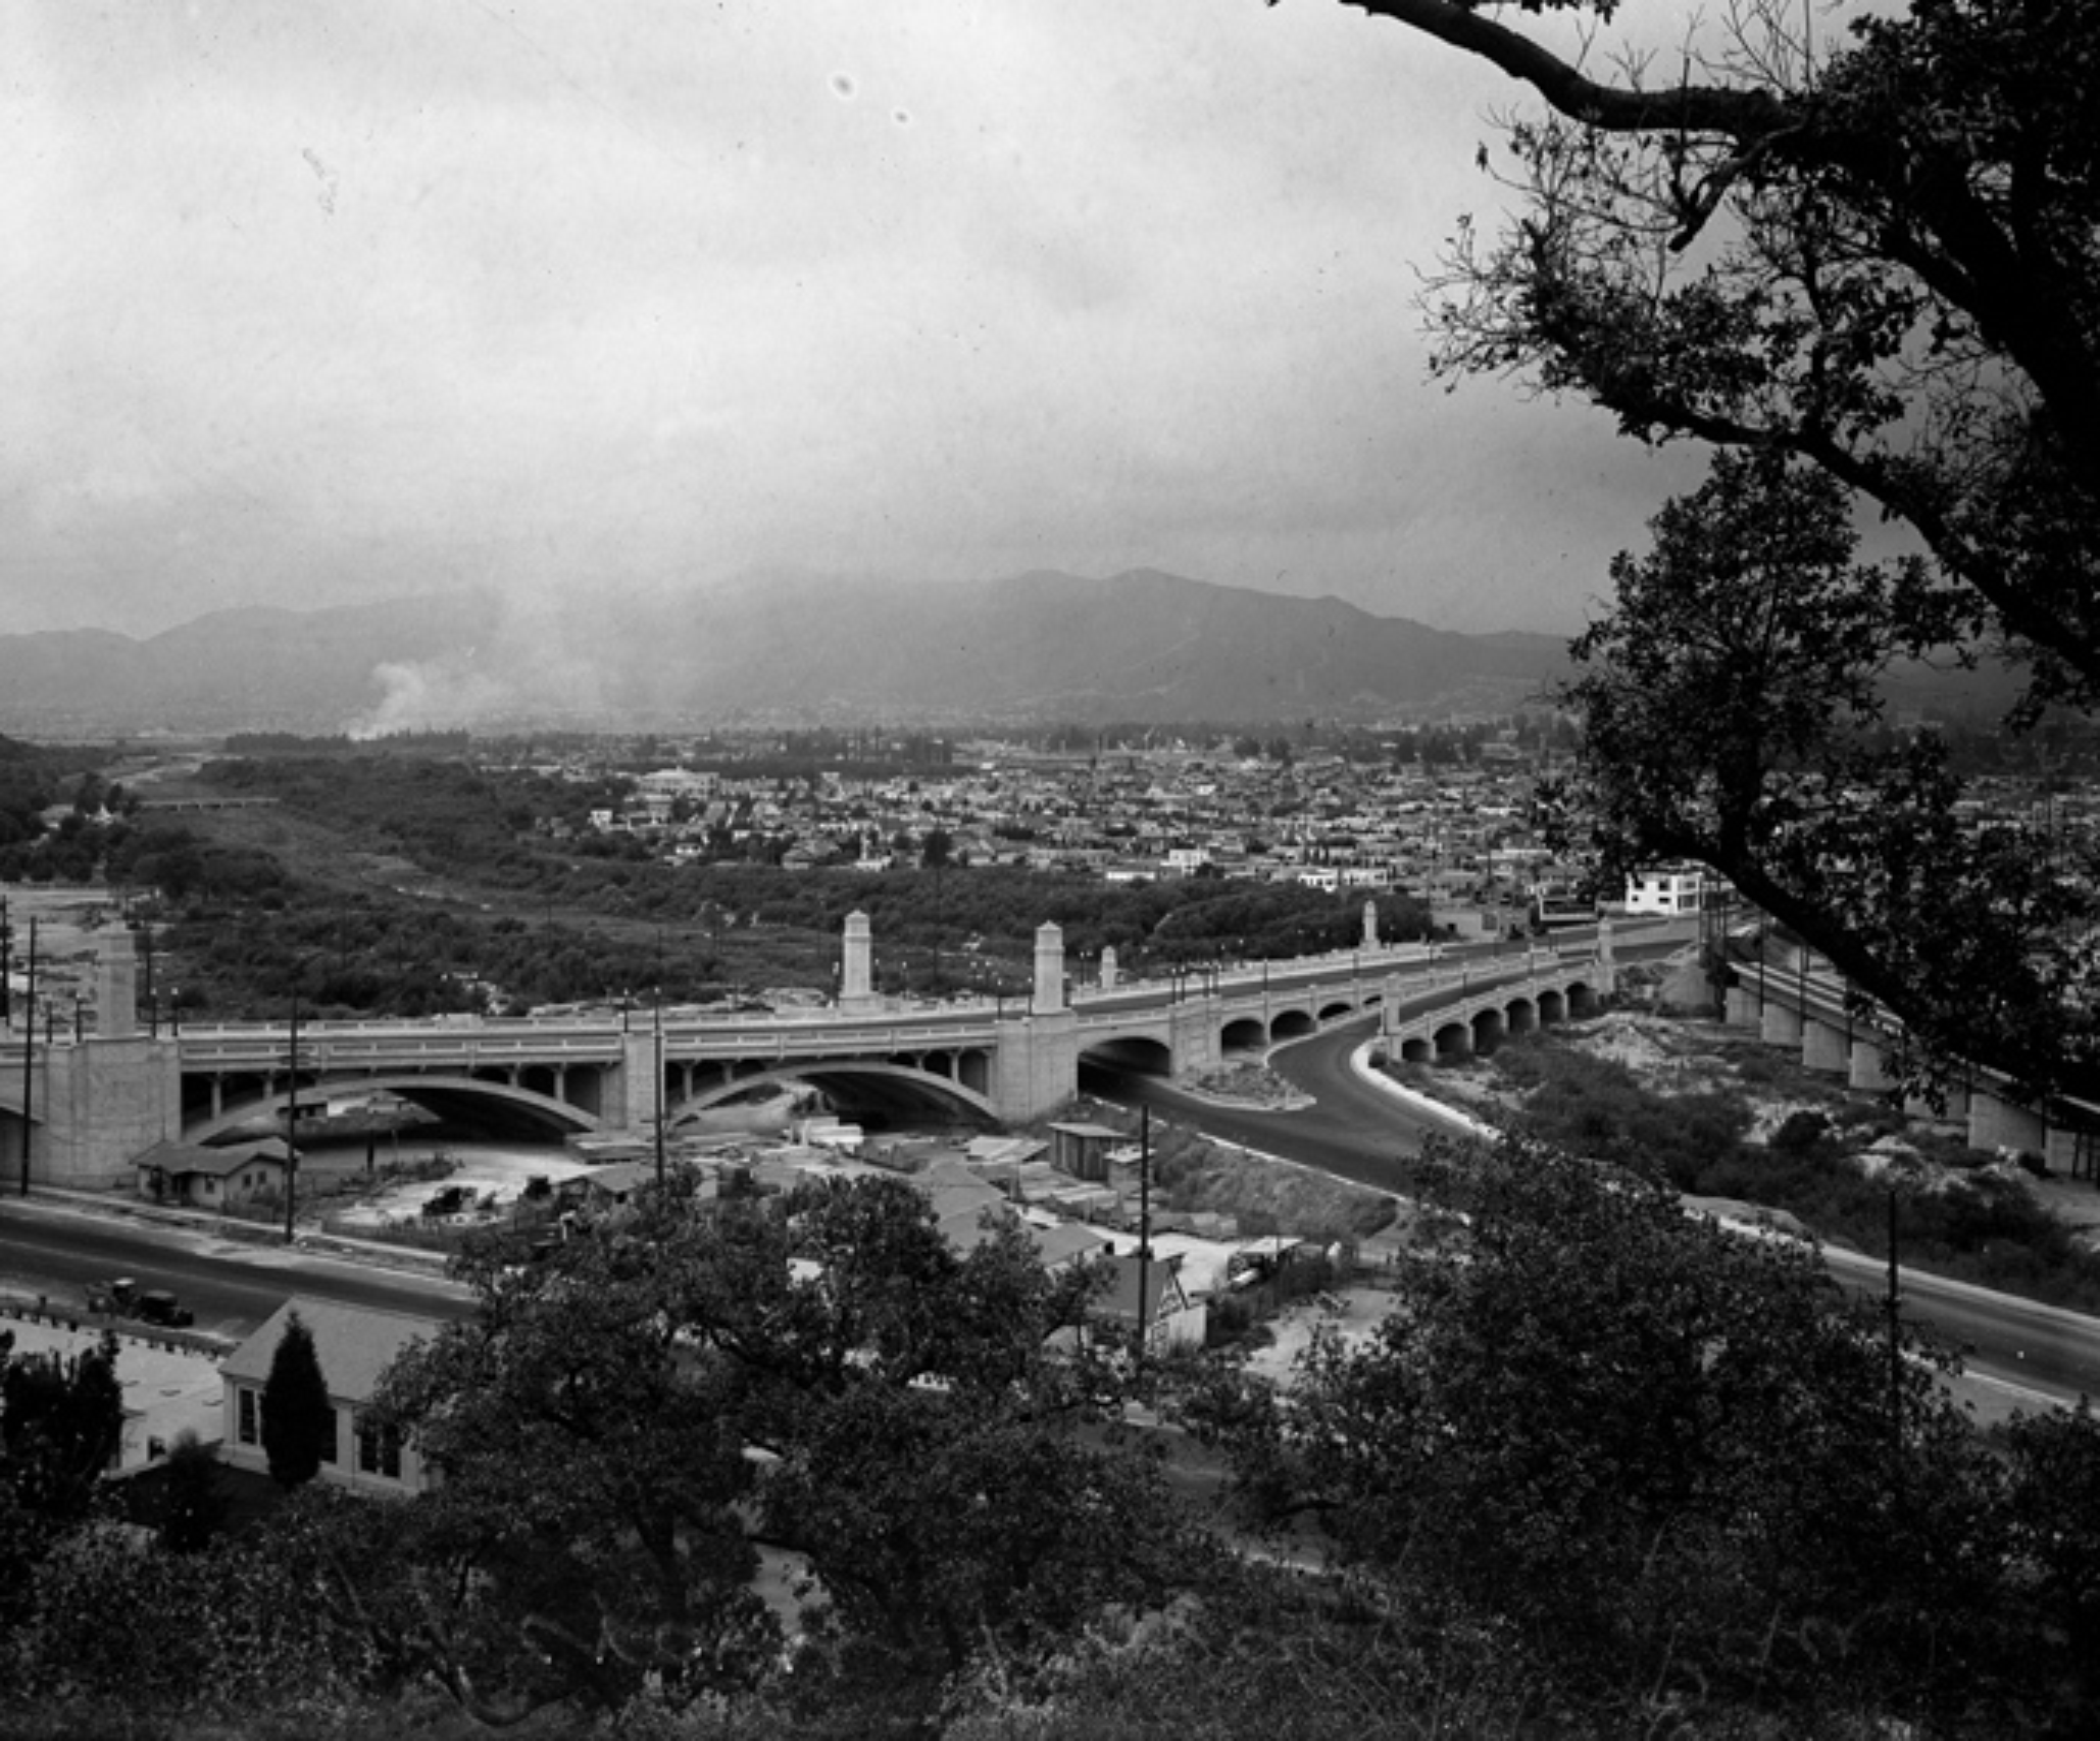 Glendale Hyperion Bridge Wikipedia